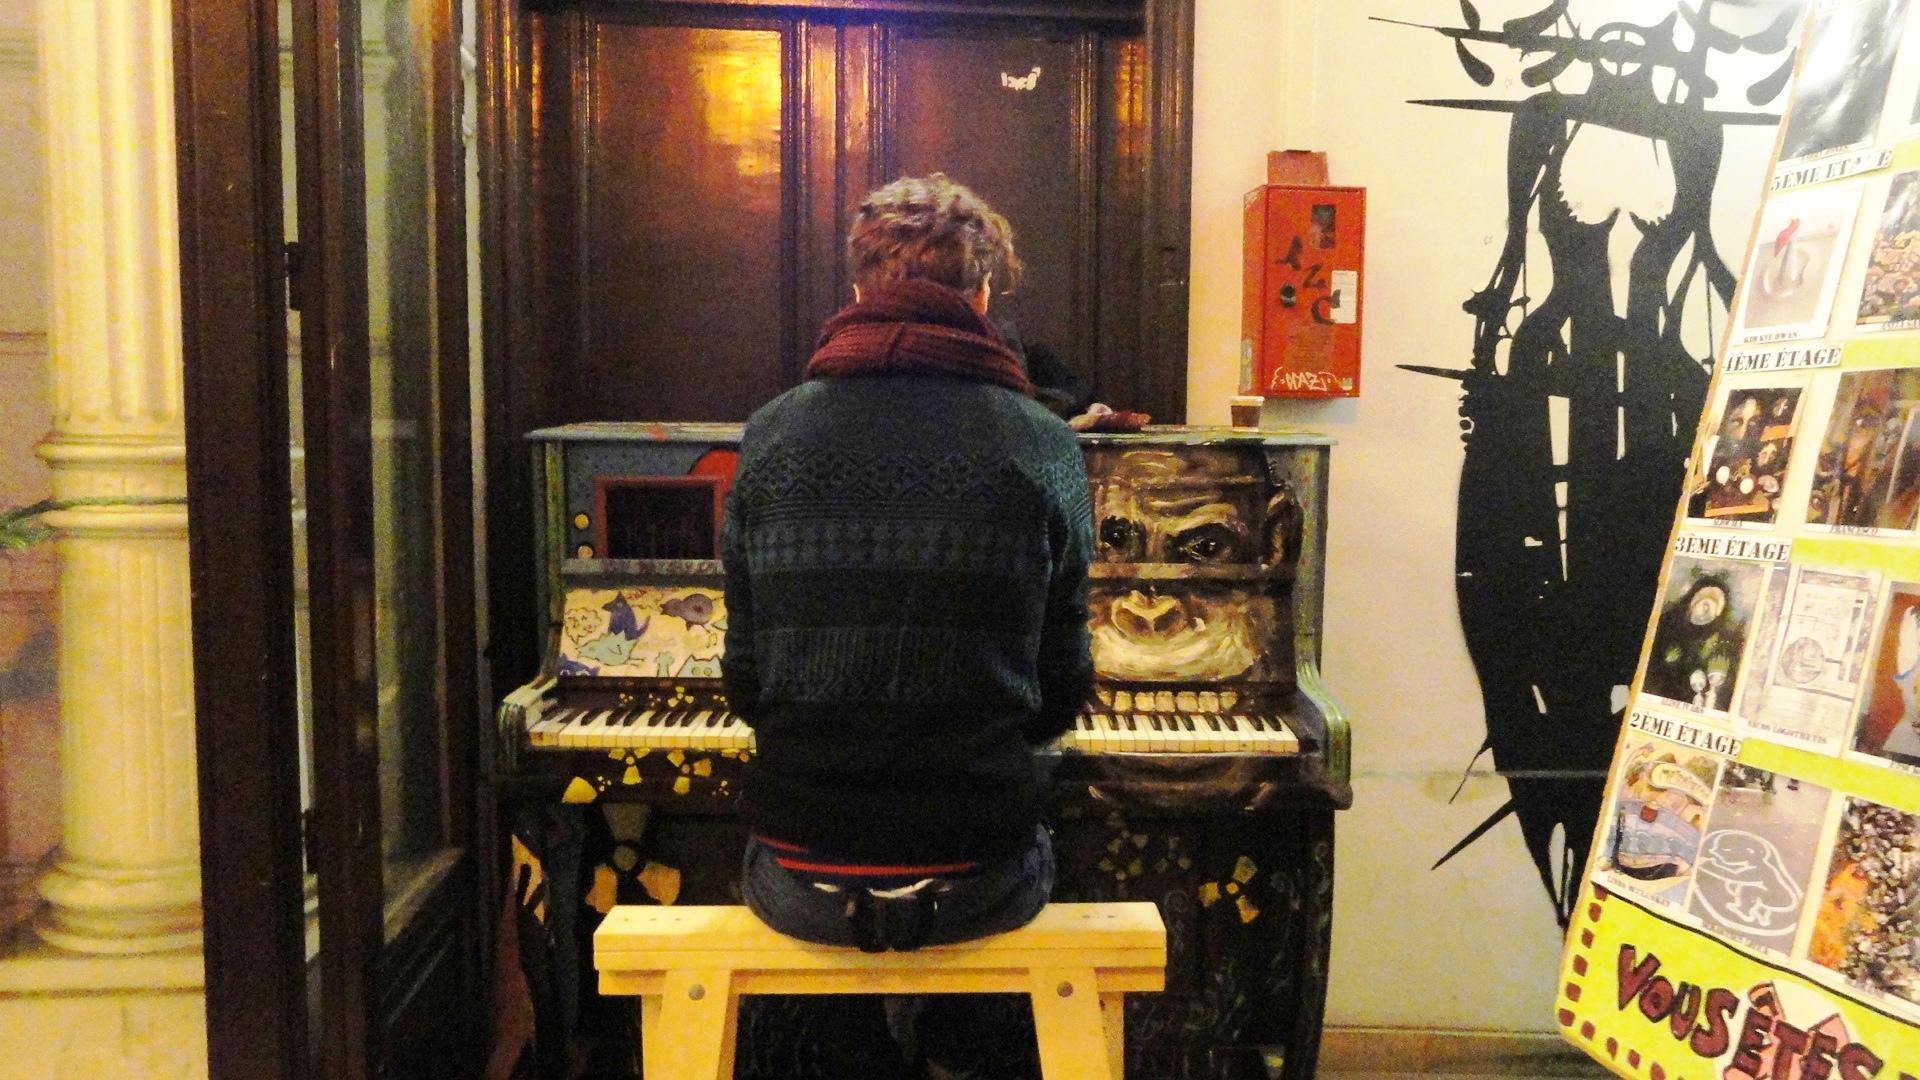 59 rue de Rivoli, Paris 1er - Piano